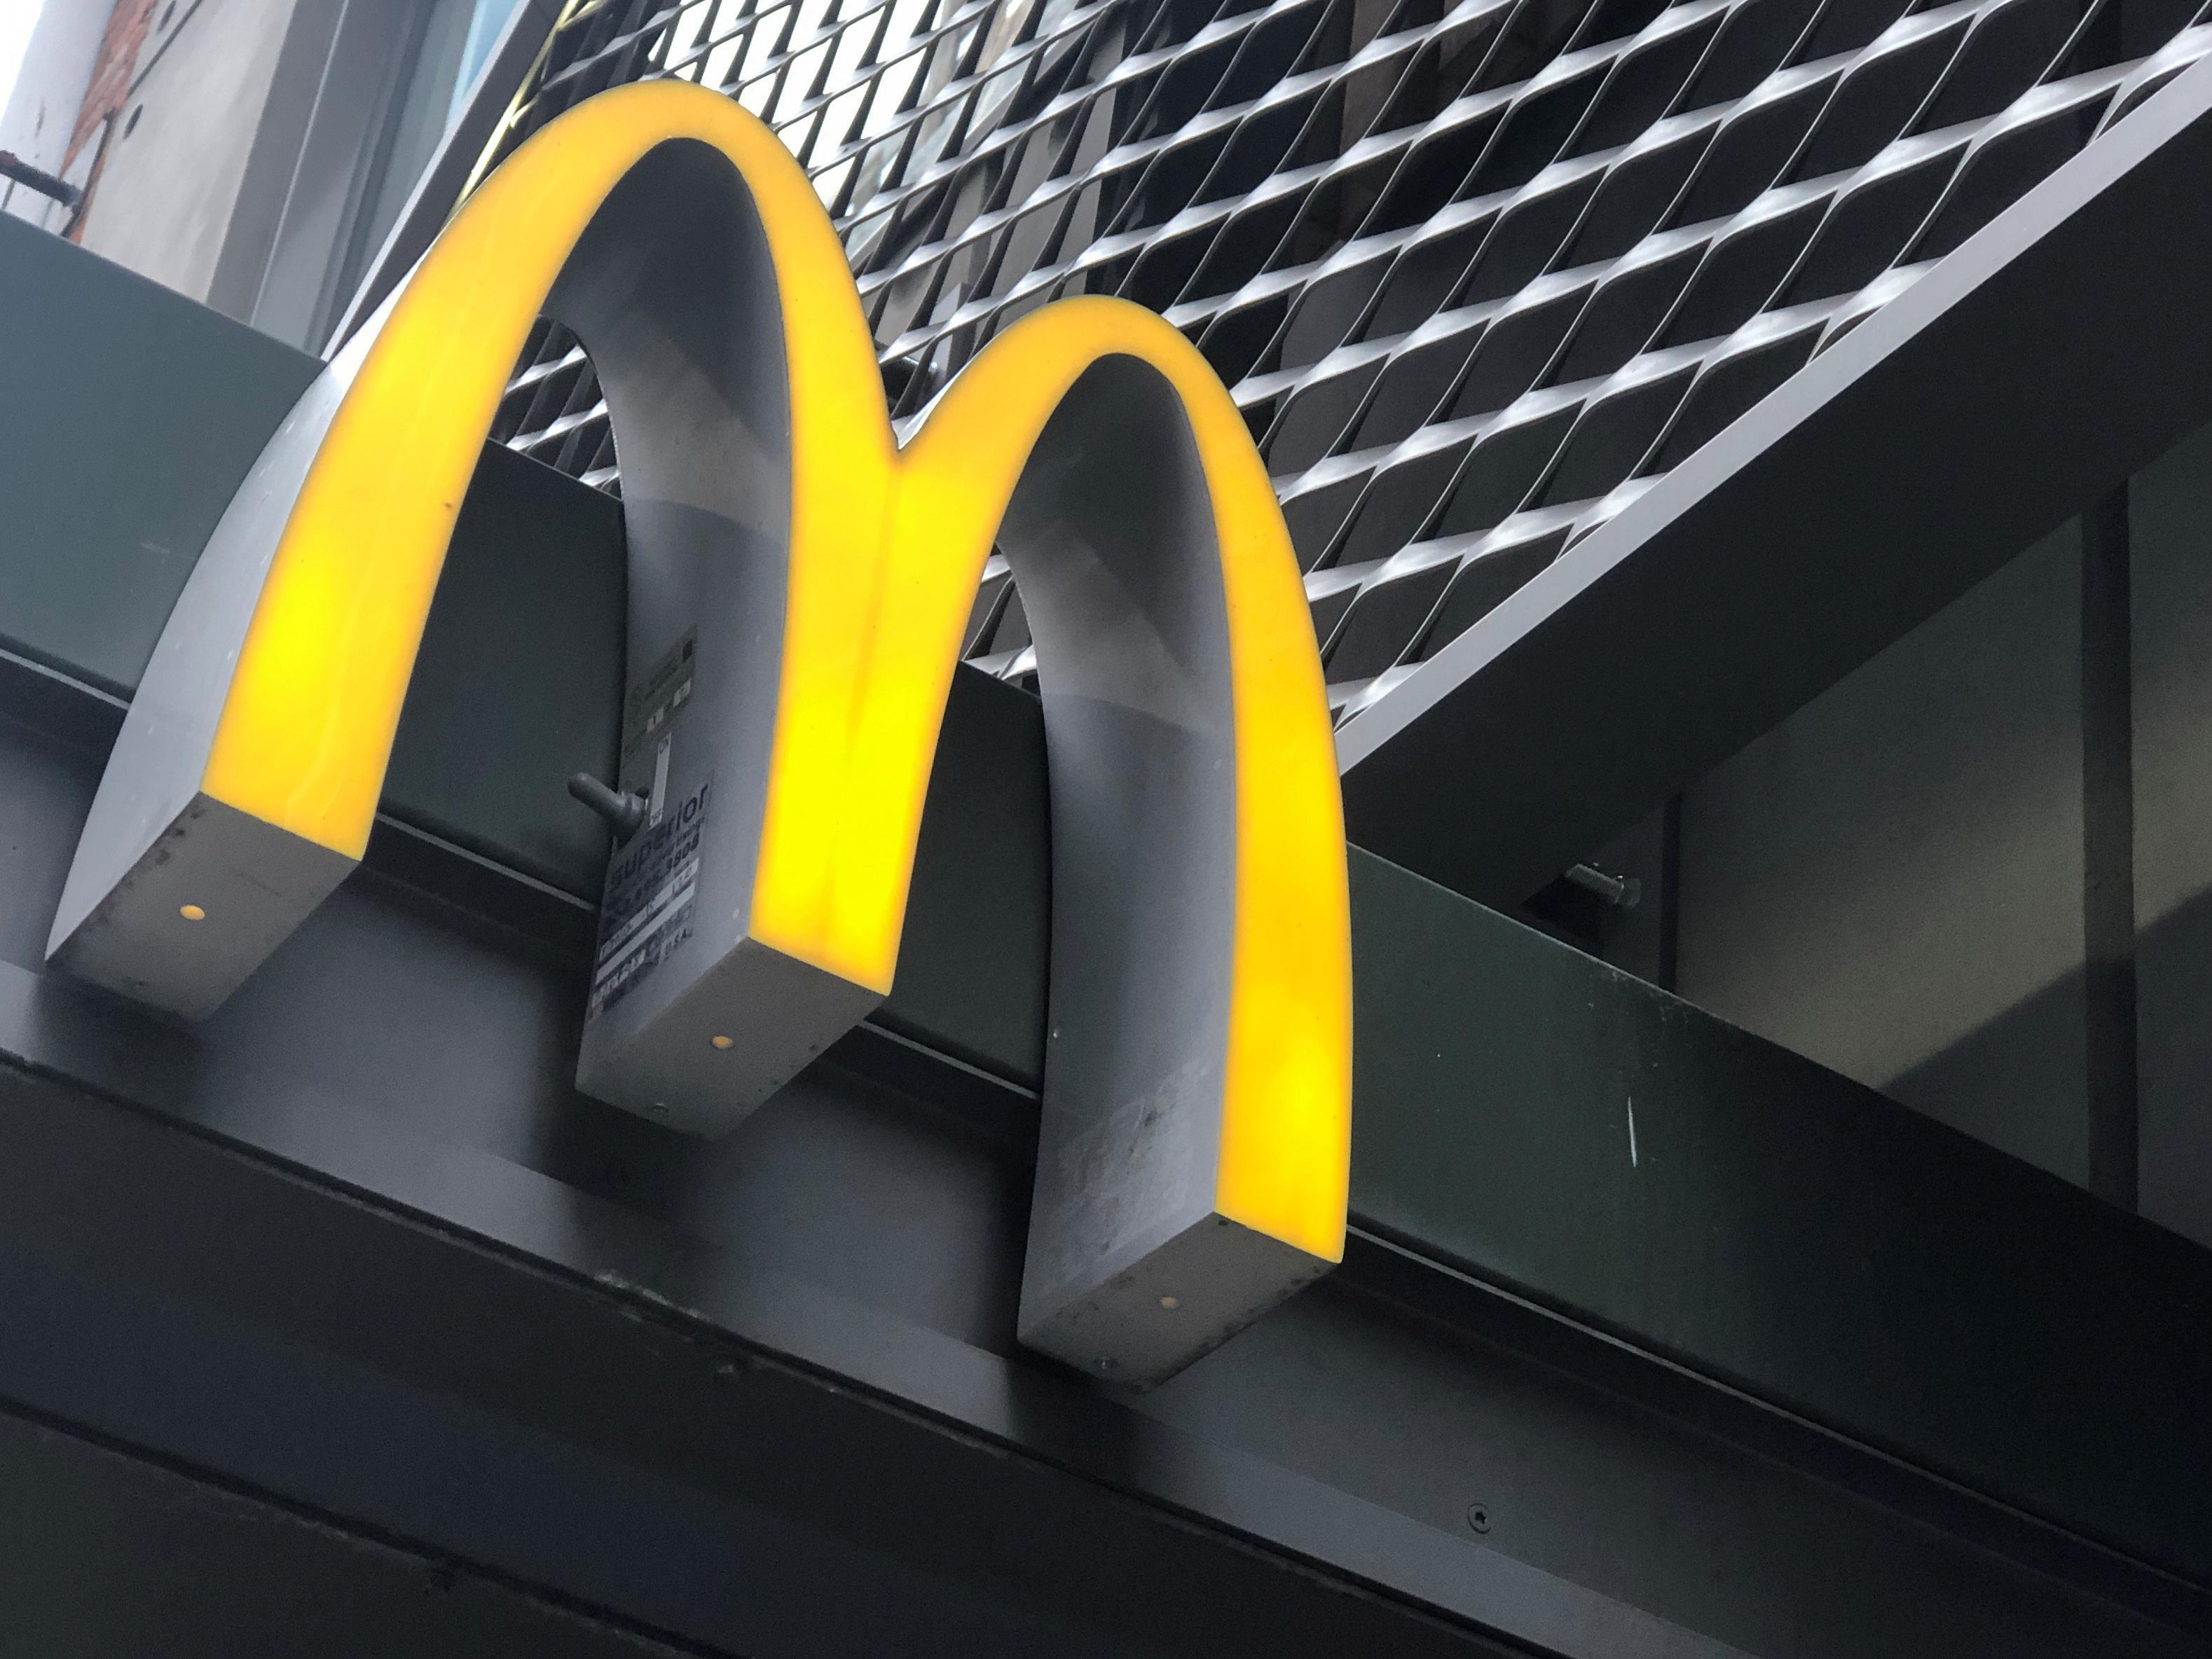 McDonald's sees higher 2020 spending on tech, R&D after sales beat